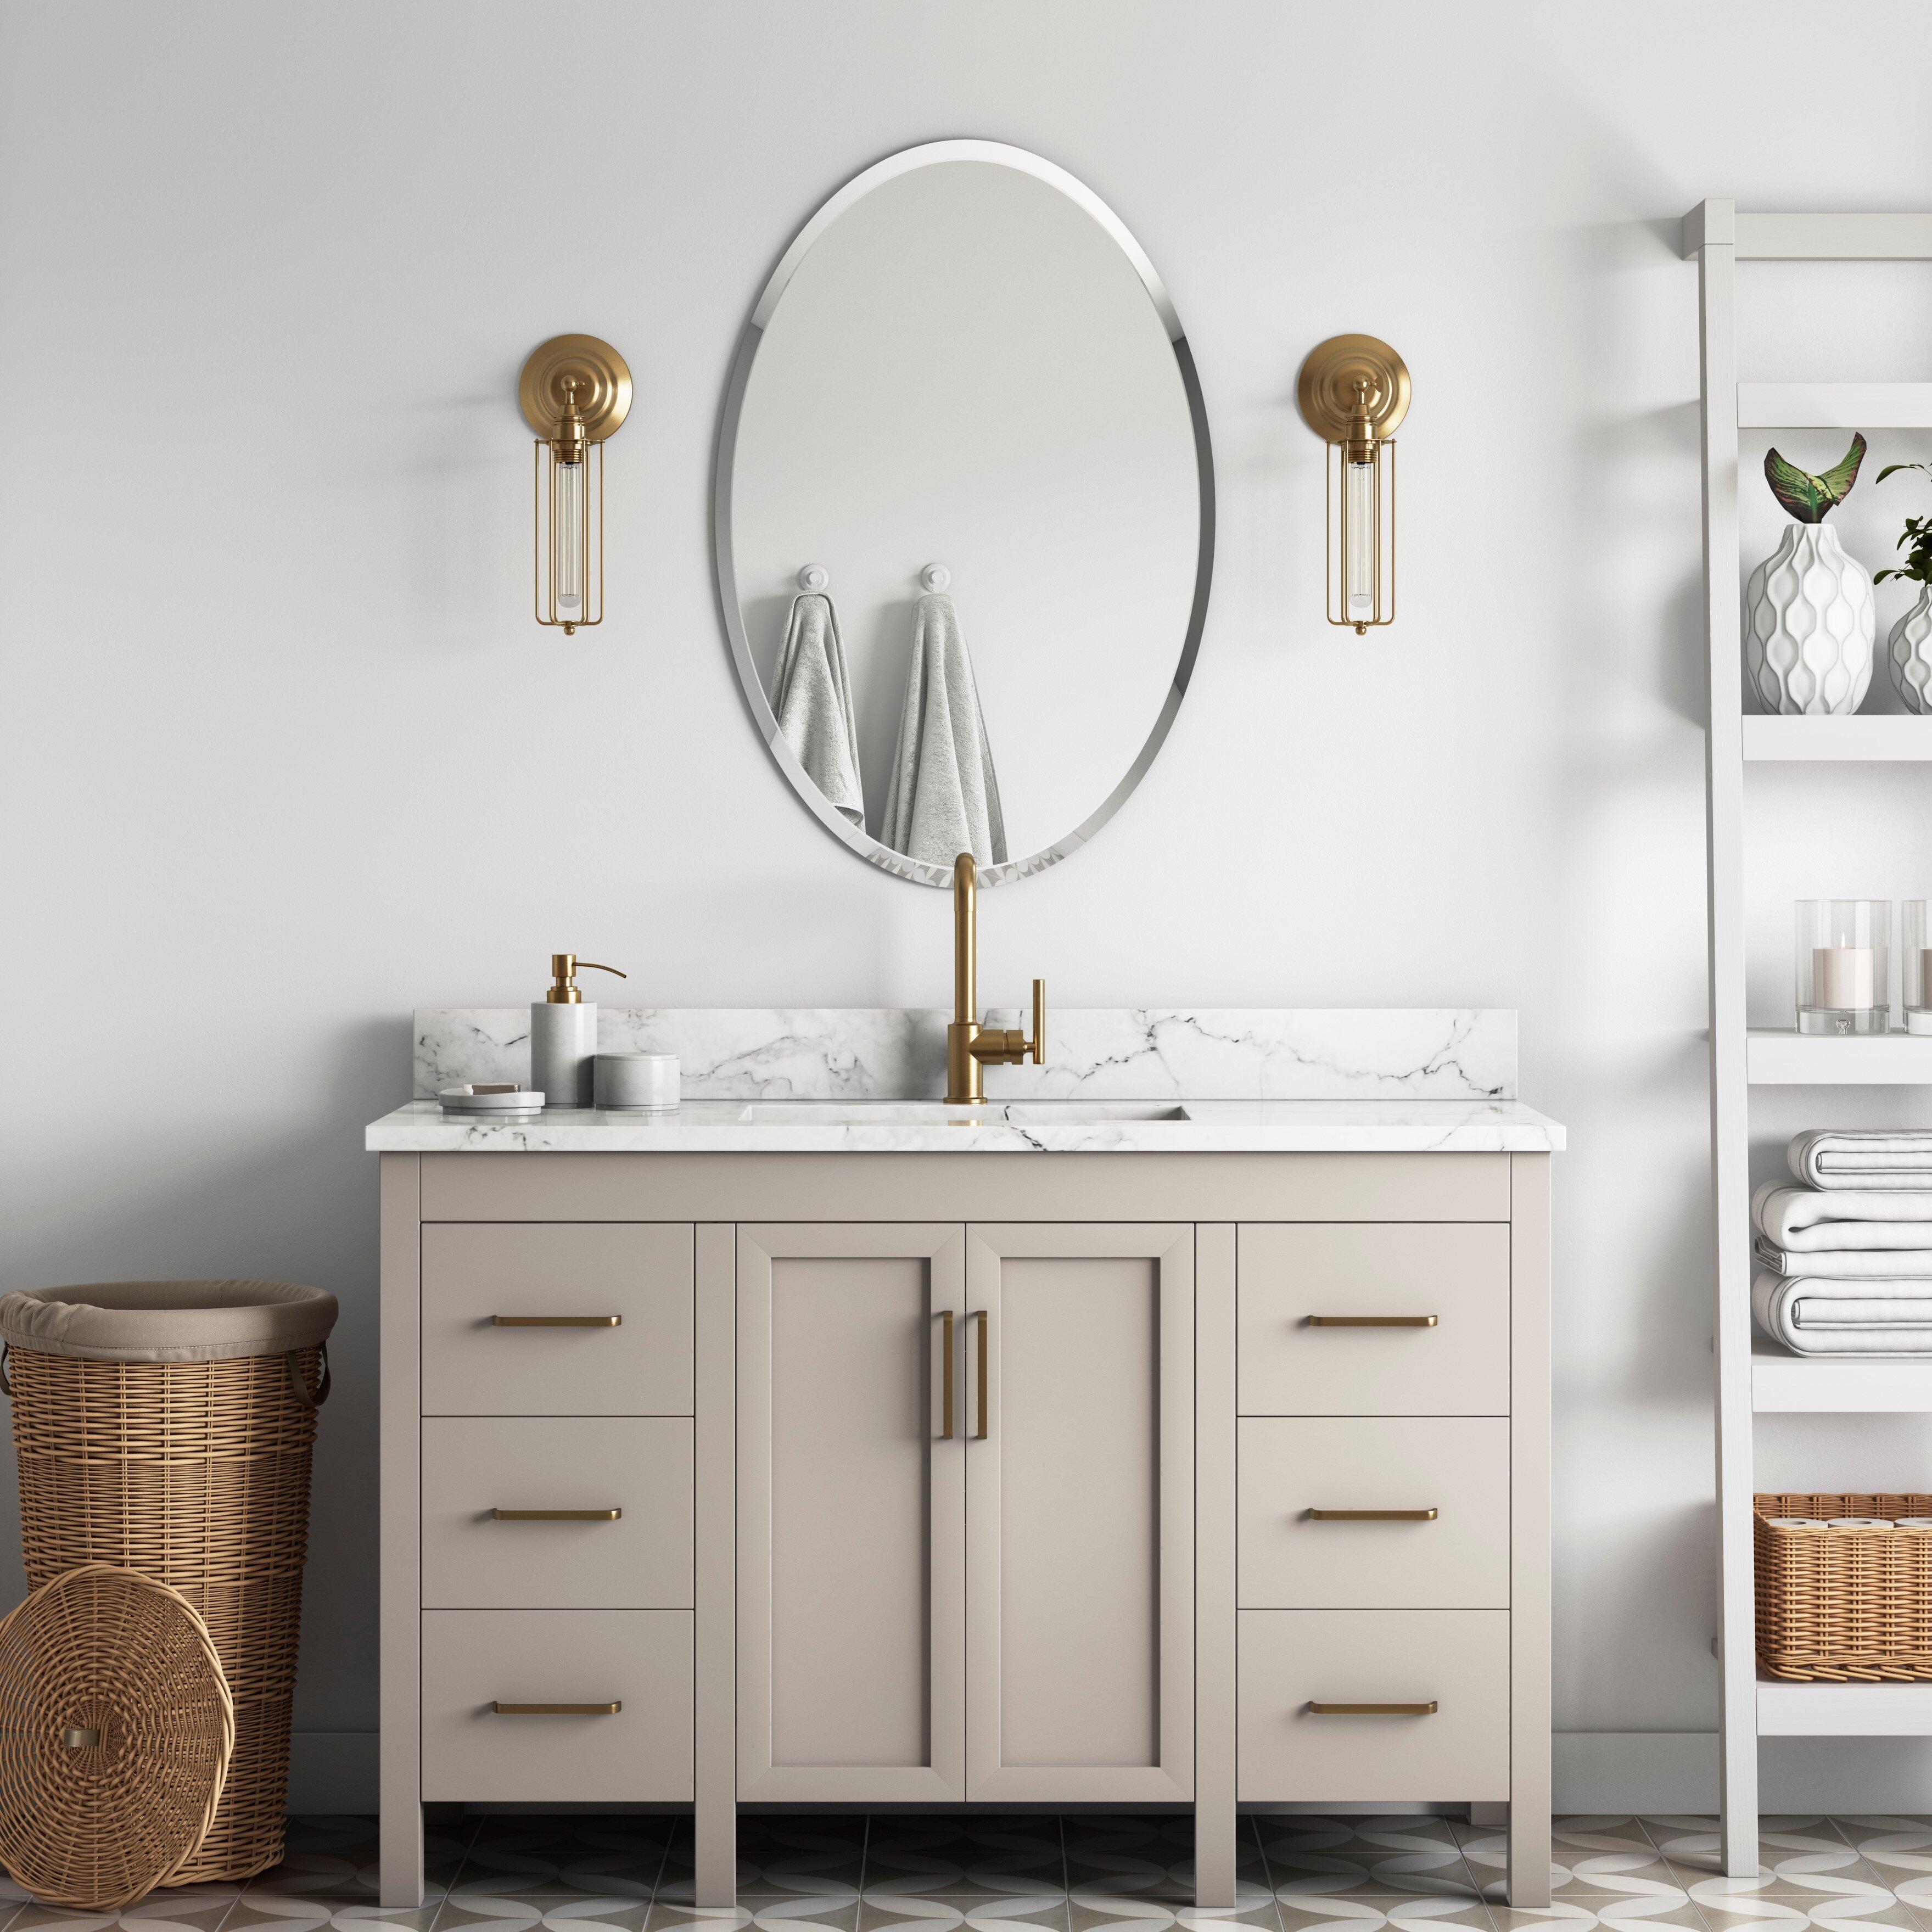 Oval Bathroom Mirrors You Ll Love In 2021 Wayfair